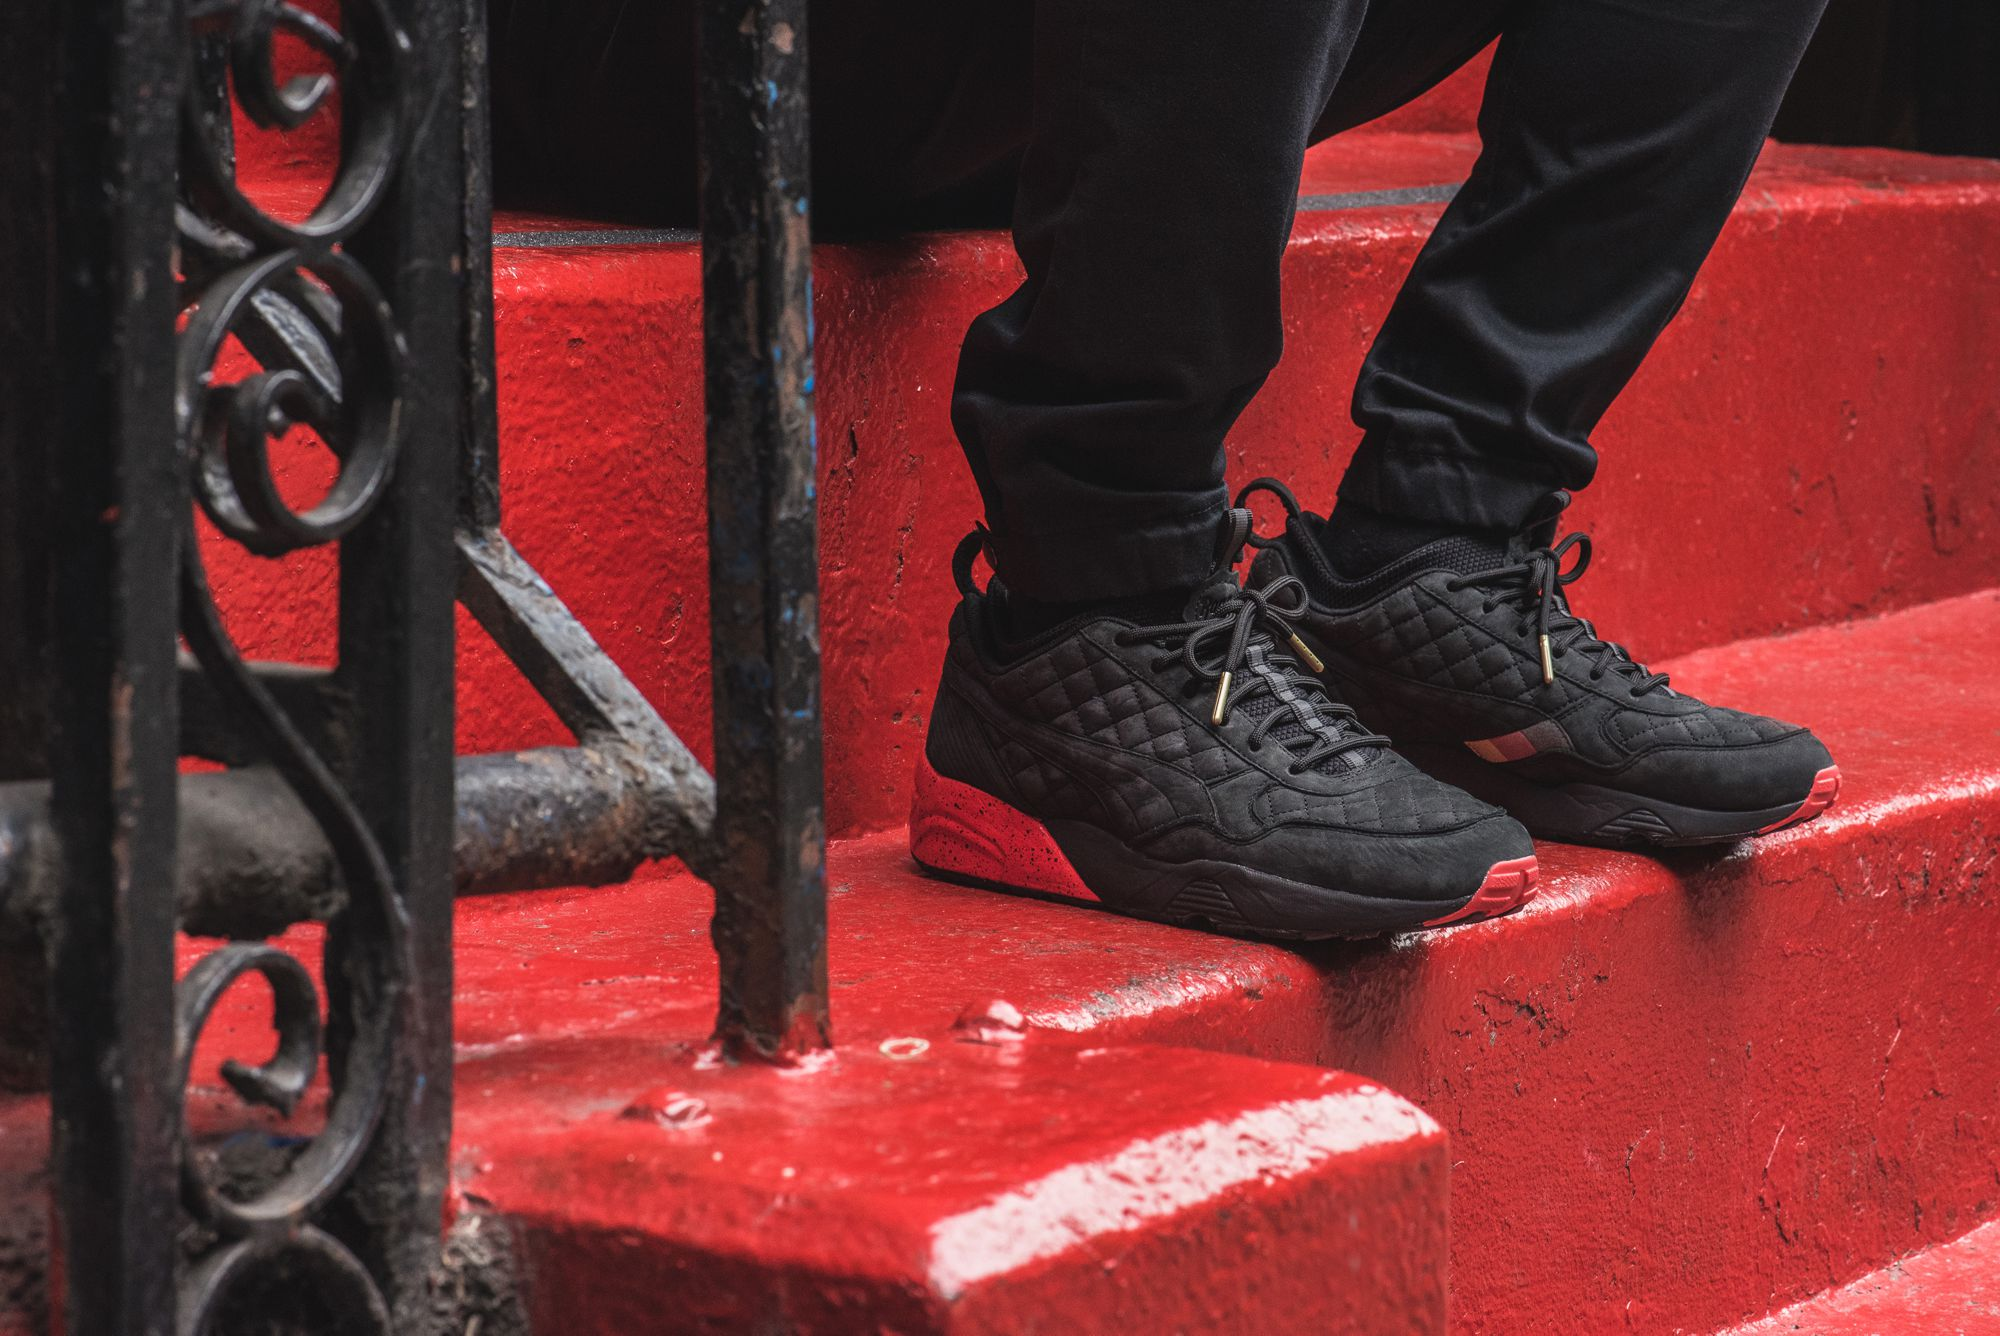 shoe-on-foot-003